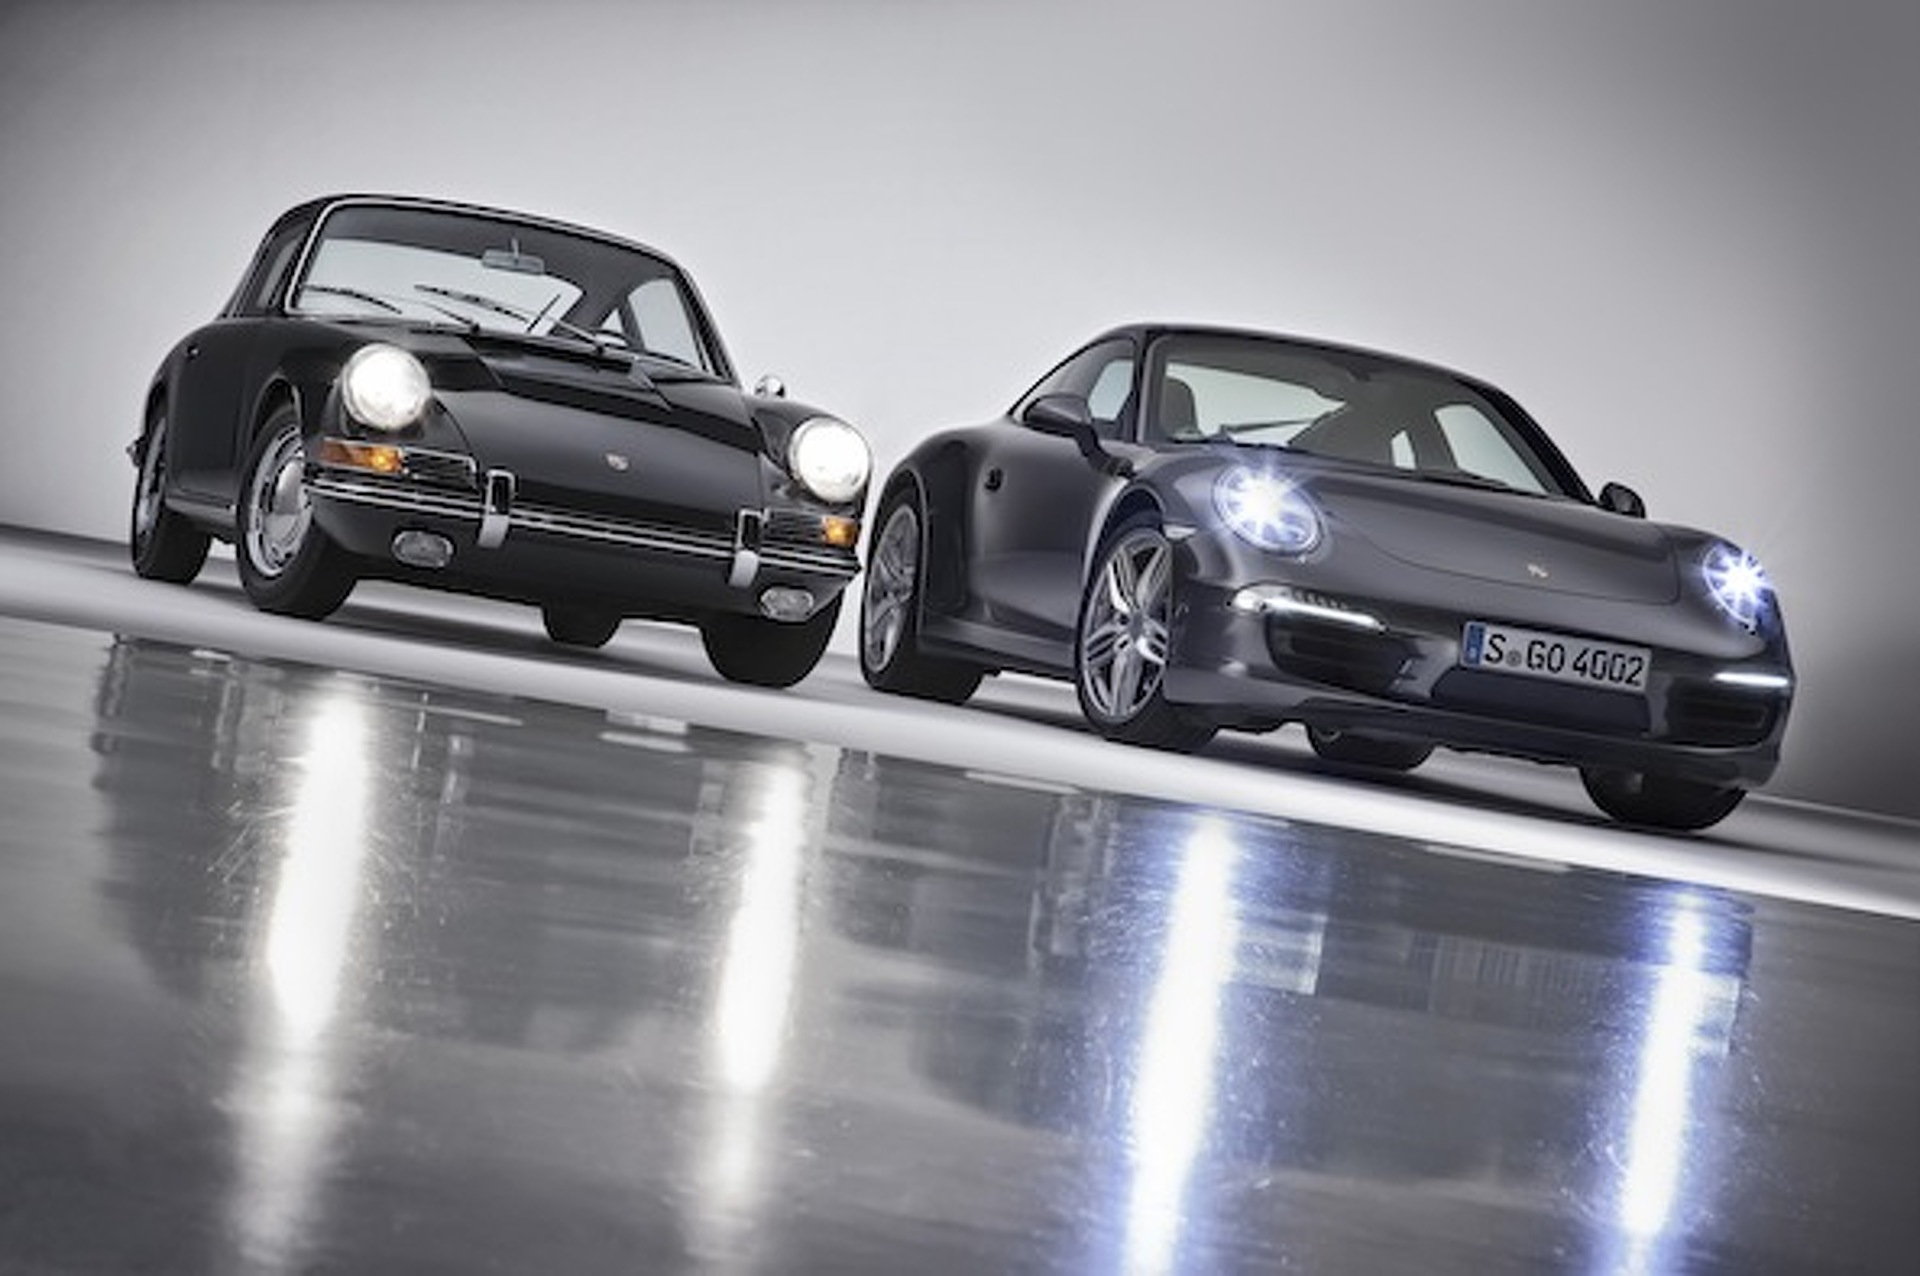 Wheels Wallpaper: 50 Years of Porsche 911 | Motor1.com Photos